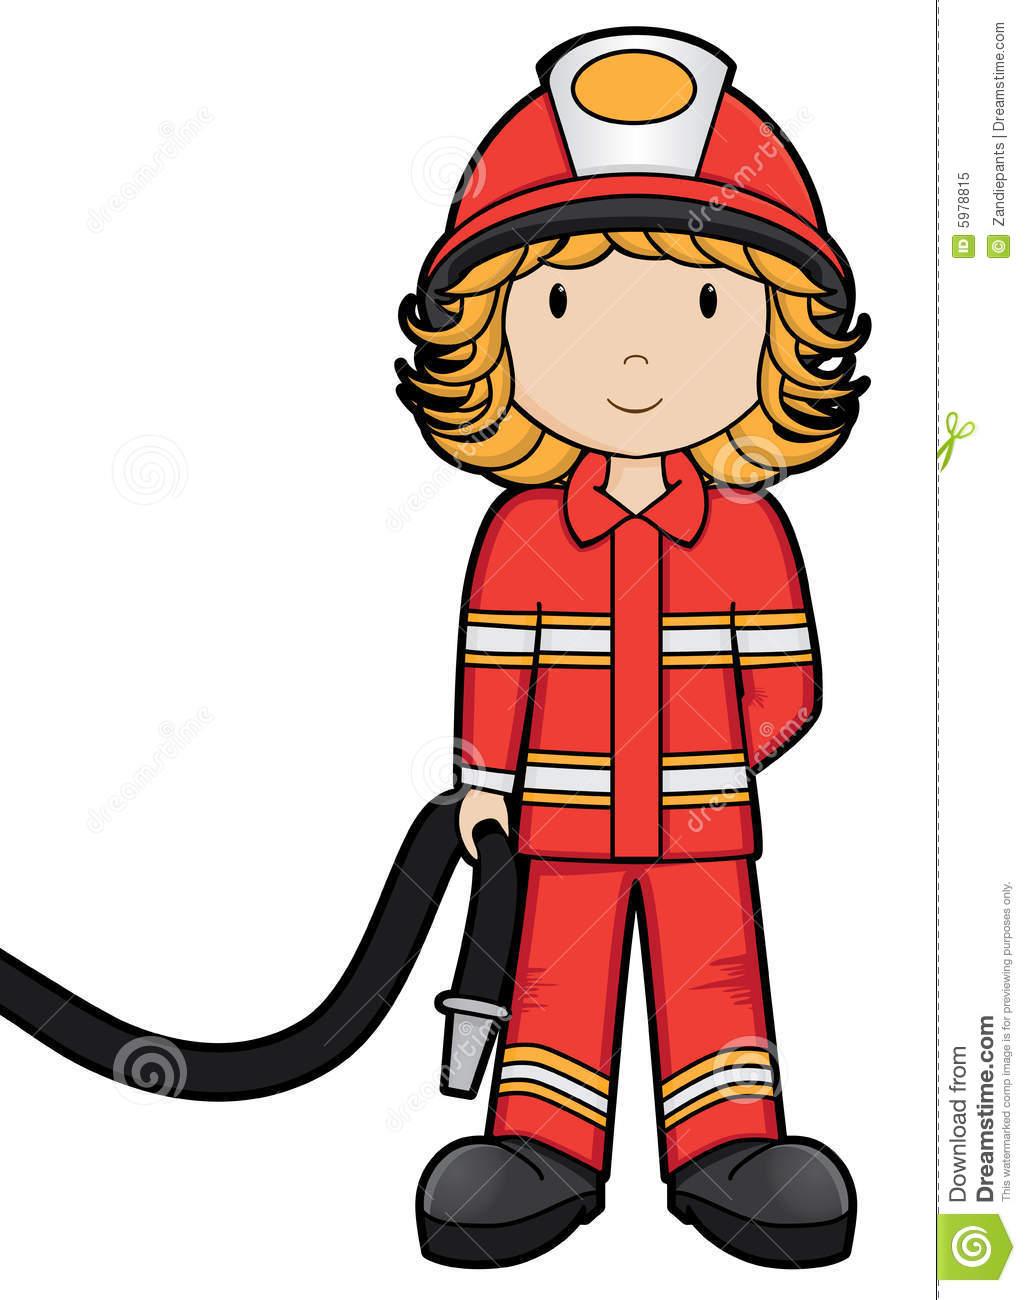 Fire Fighter Clip Art. Fire Girl Vector -Fire Fighter Clip Art. Fire Girl Vector Royalty Free Stock Photo Image 5978815-2